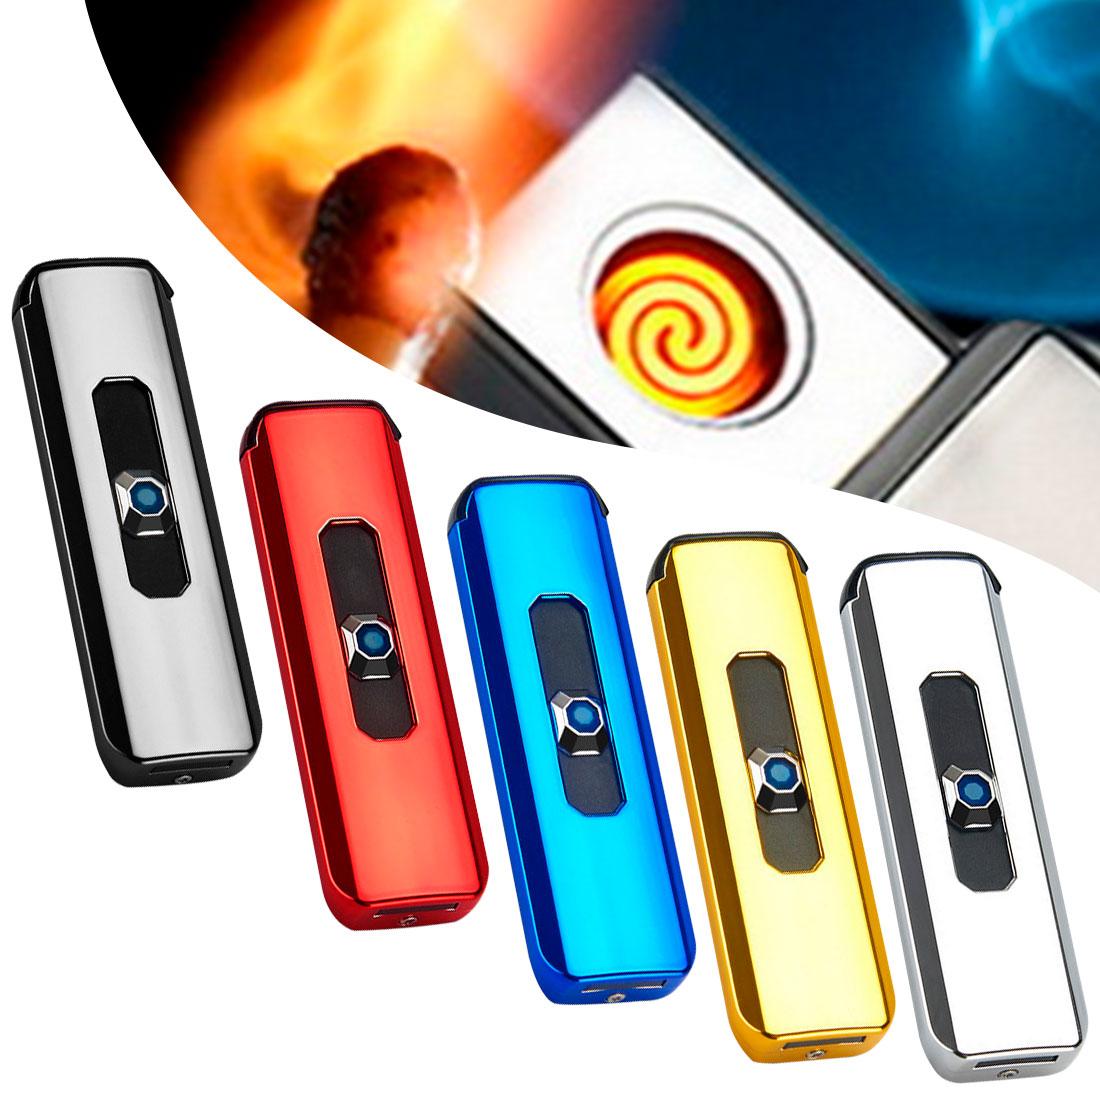 AliExpress - Electric Lighter Gift for Men Lighters Bulk Gadgets 2021 Mini Lighter Usb Lighter Touch Screen Rechargeable Metal Lighter